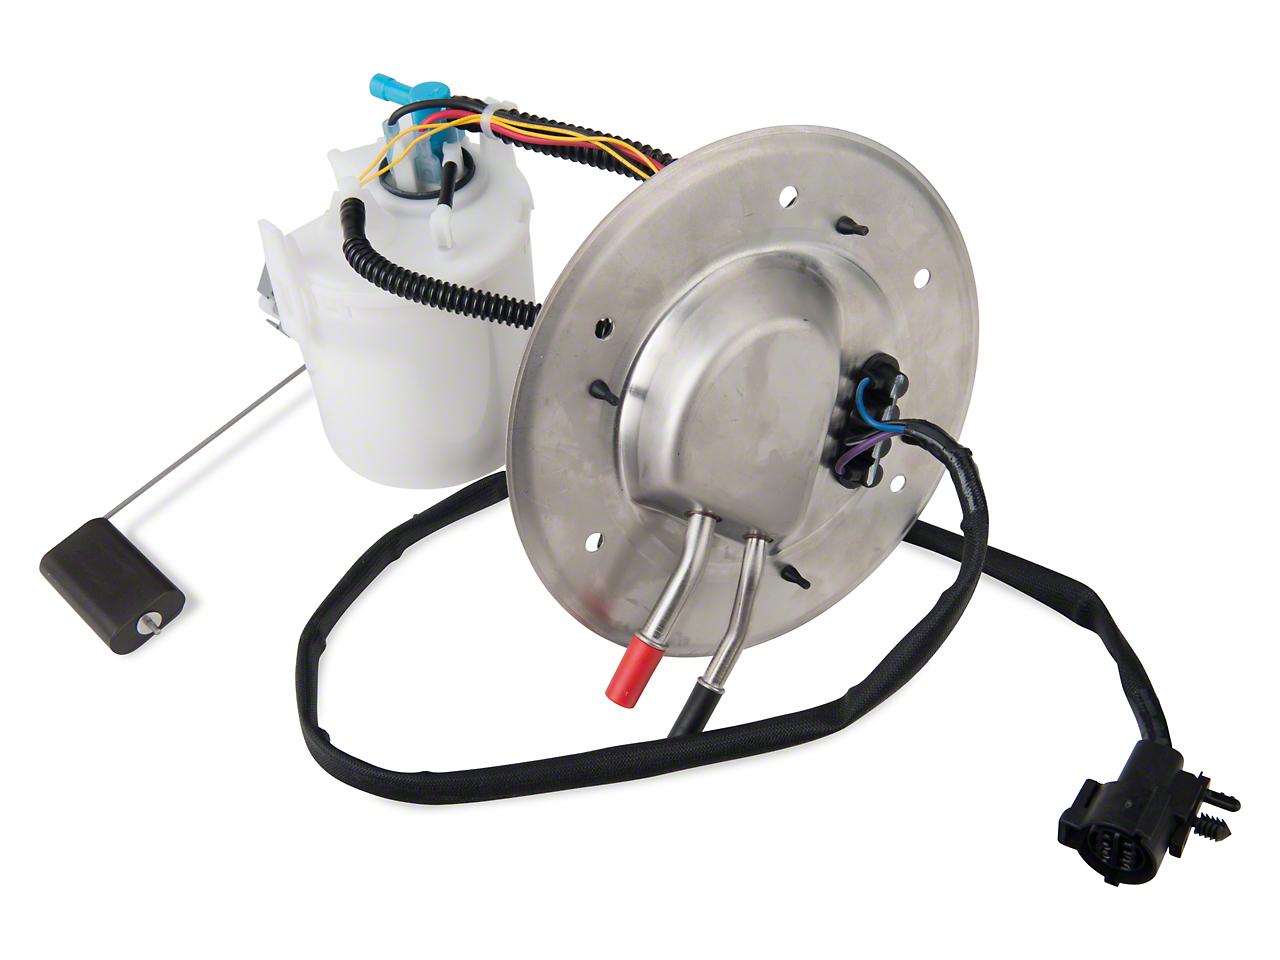 BBK Direct Replacement Fuel Pump - 300 LPH (98 All)